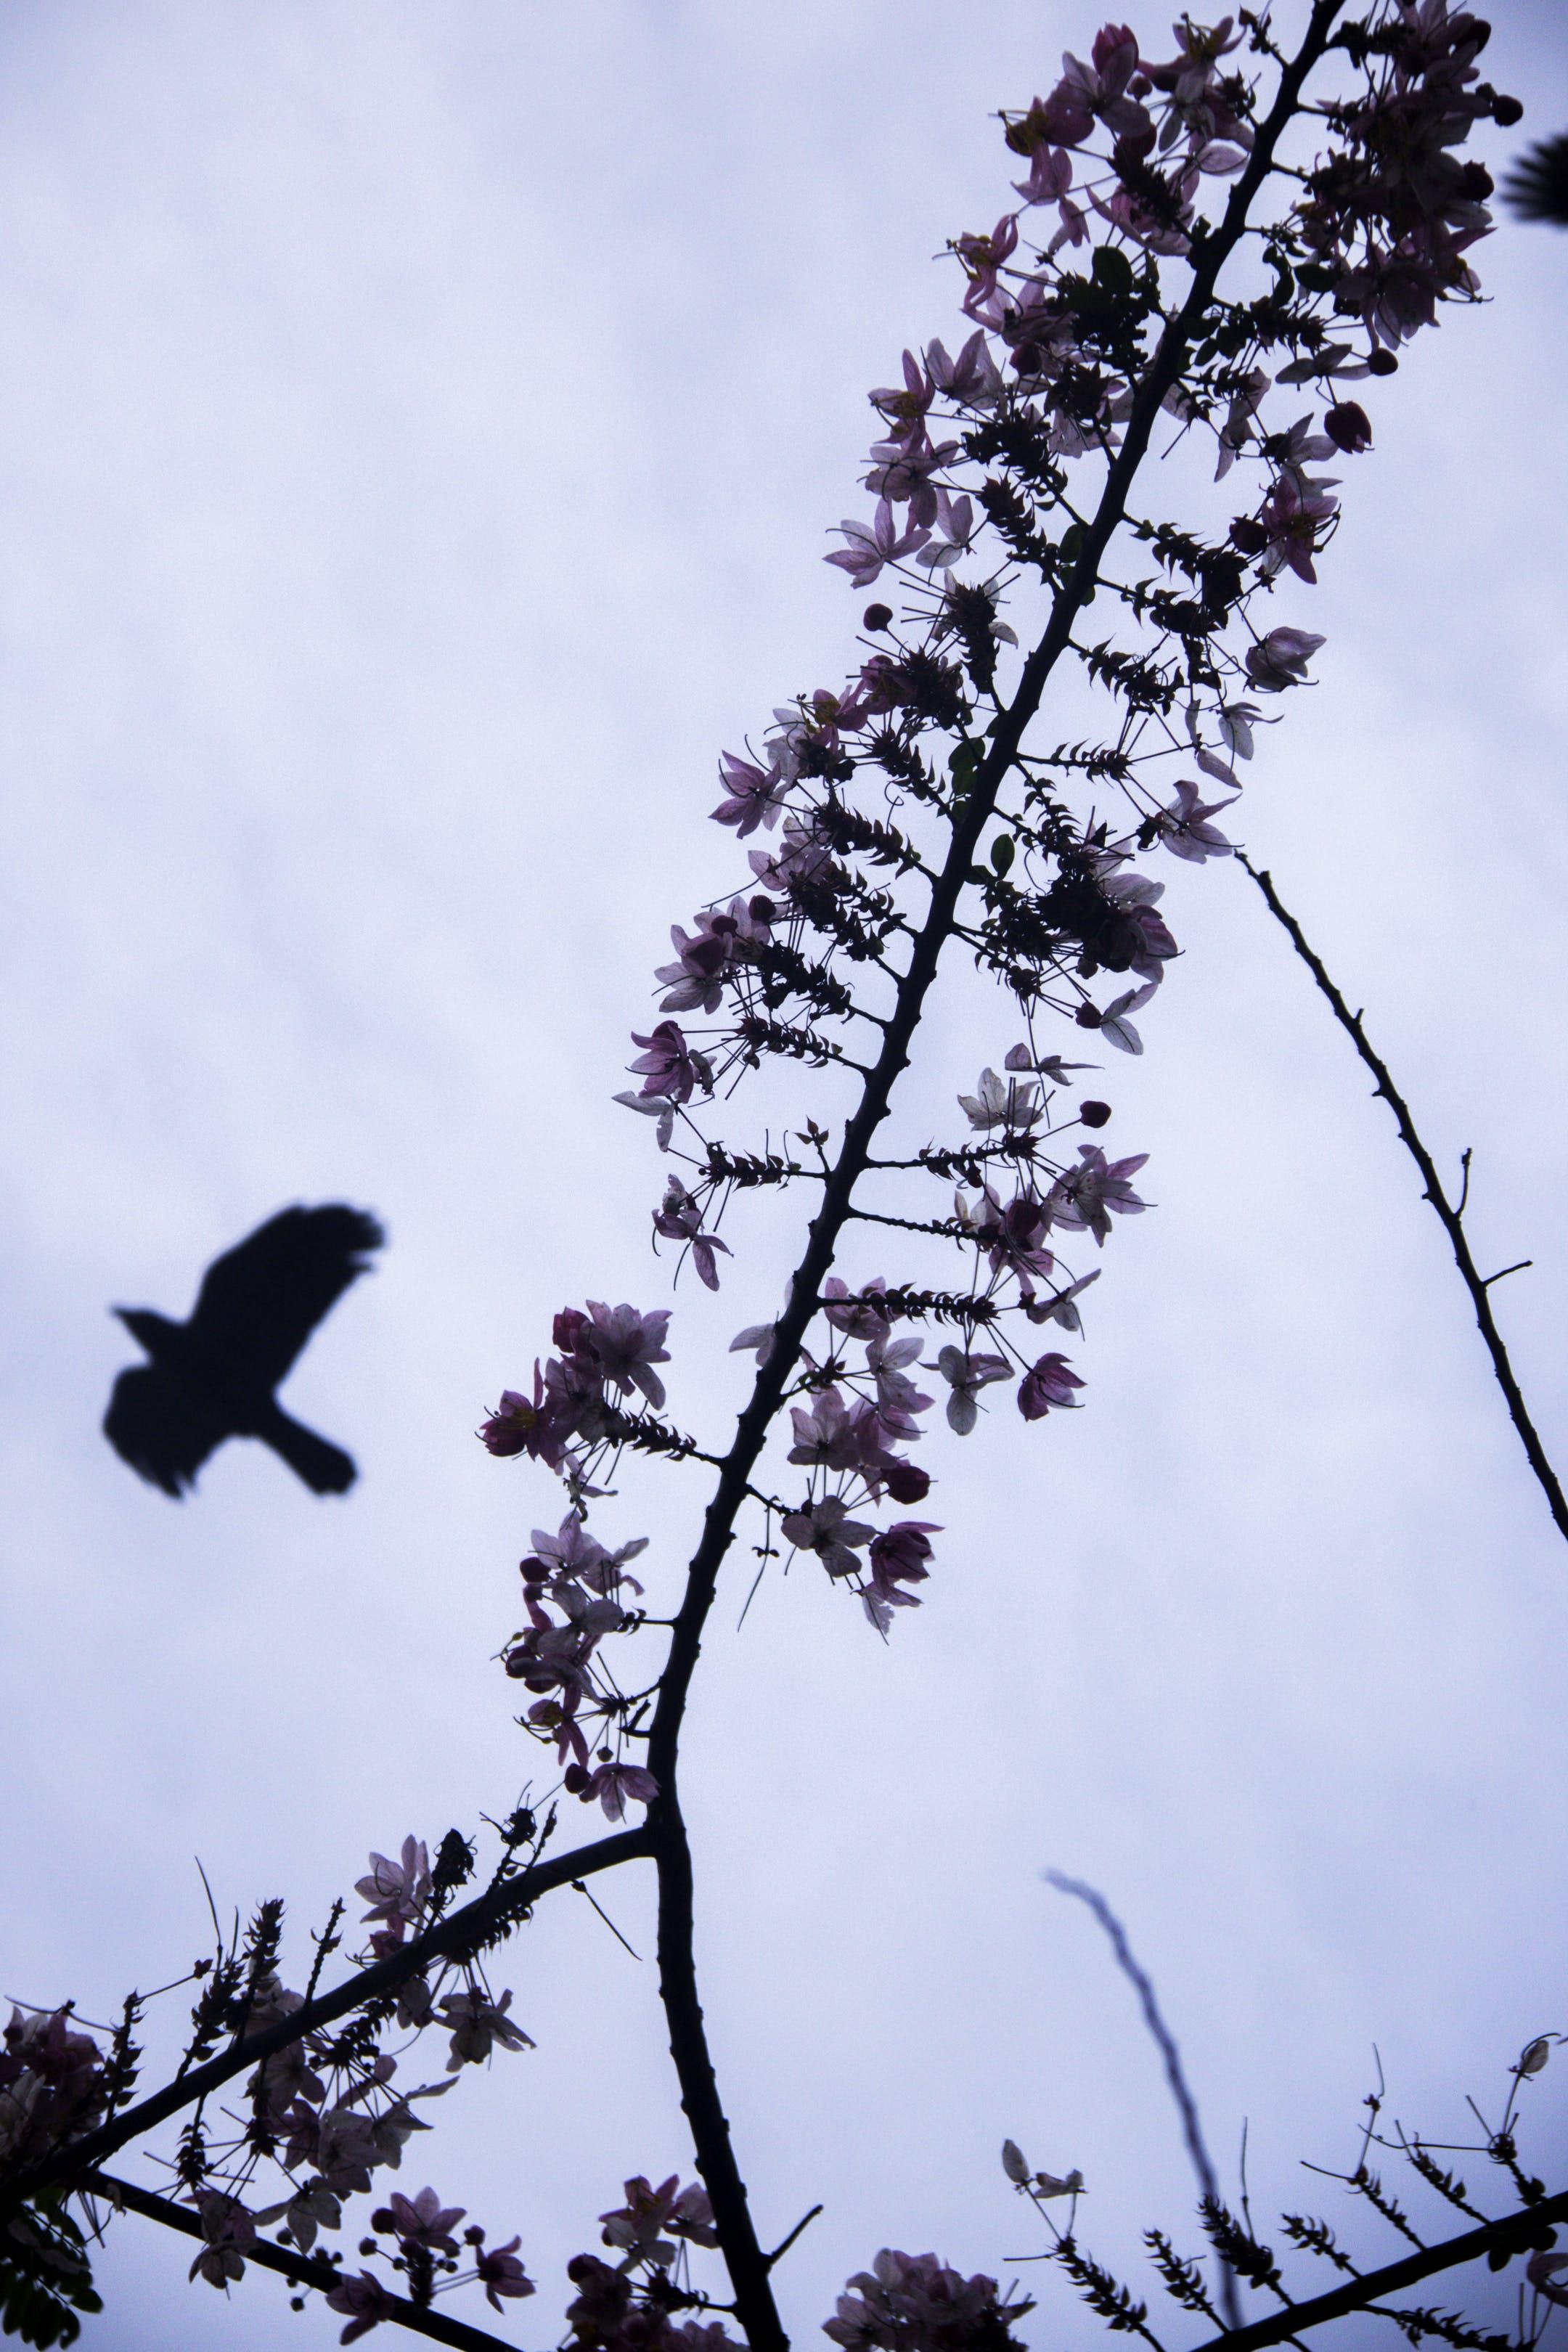 Free stock photo of #bird #flower #sky#nature